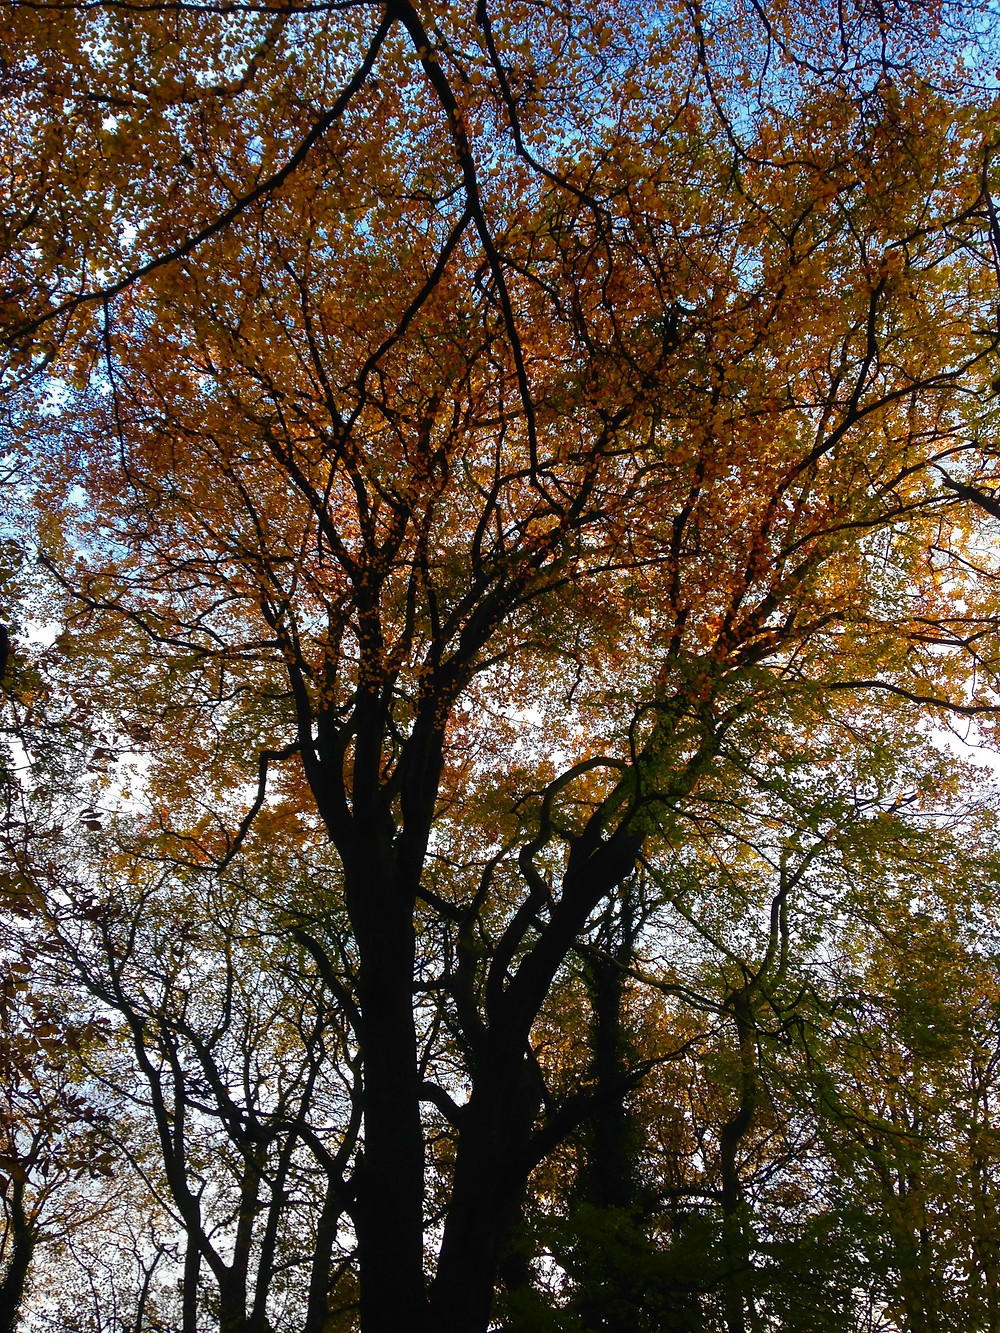 Autumn Beech Tree Canopy